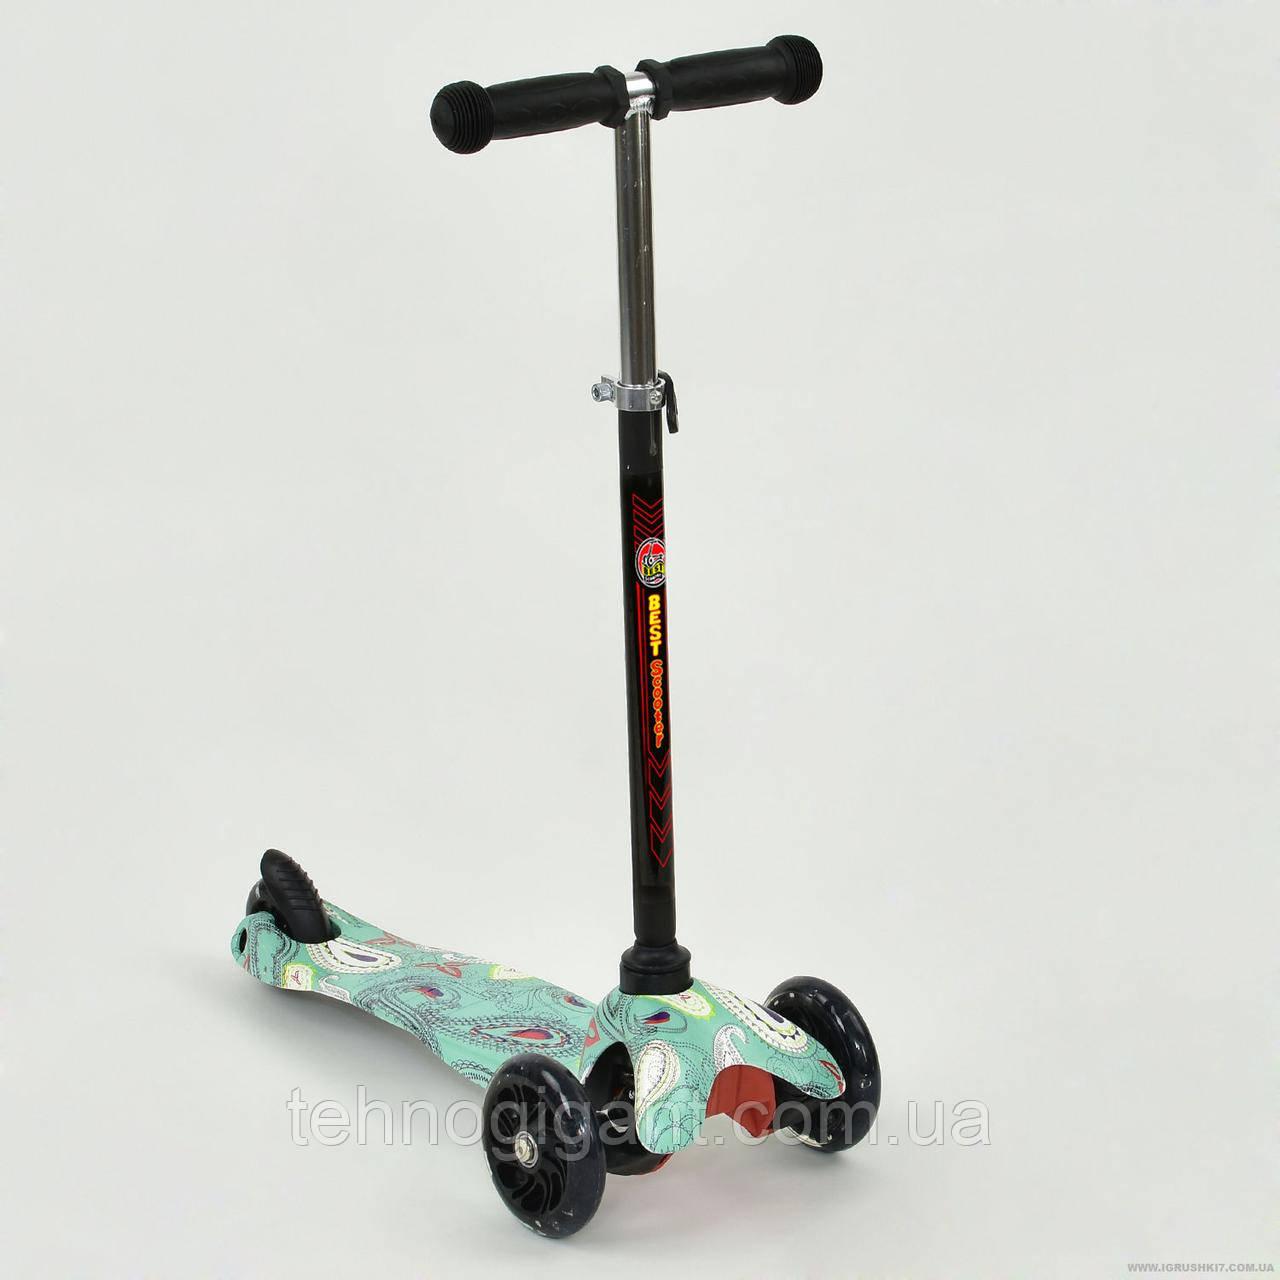 Трехколесный самокат  со светящимися колесами Best Scooter Mini